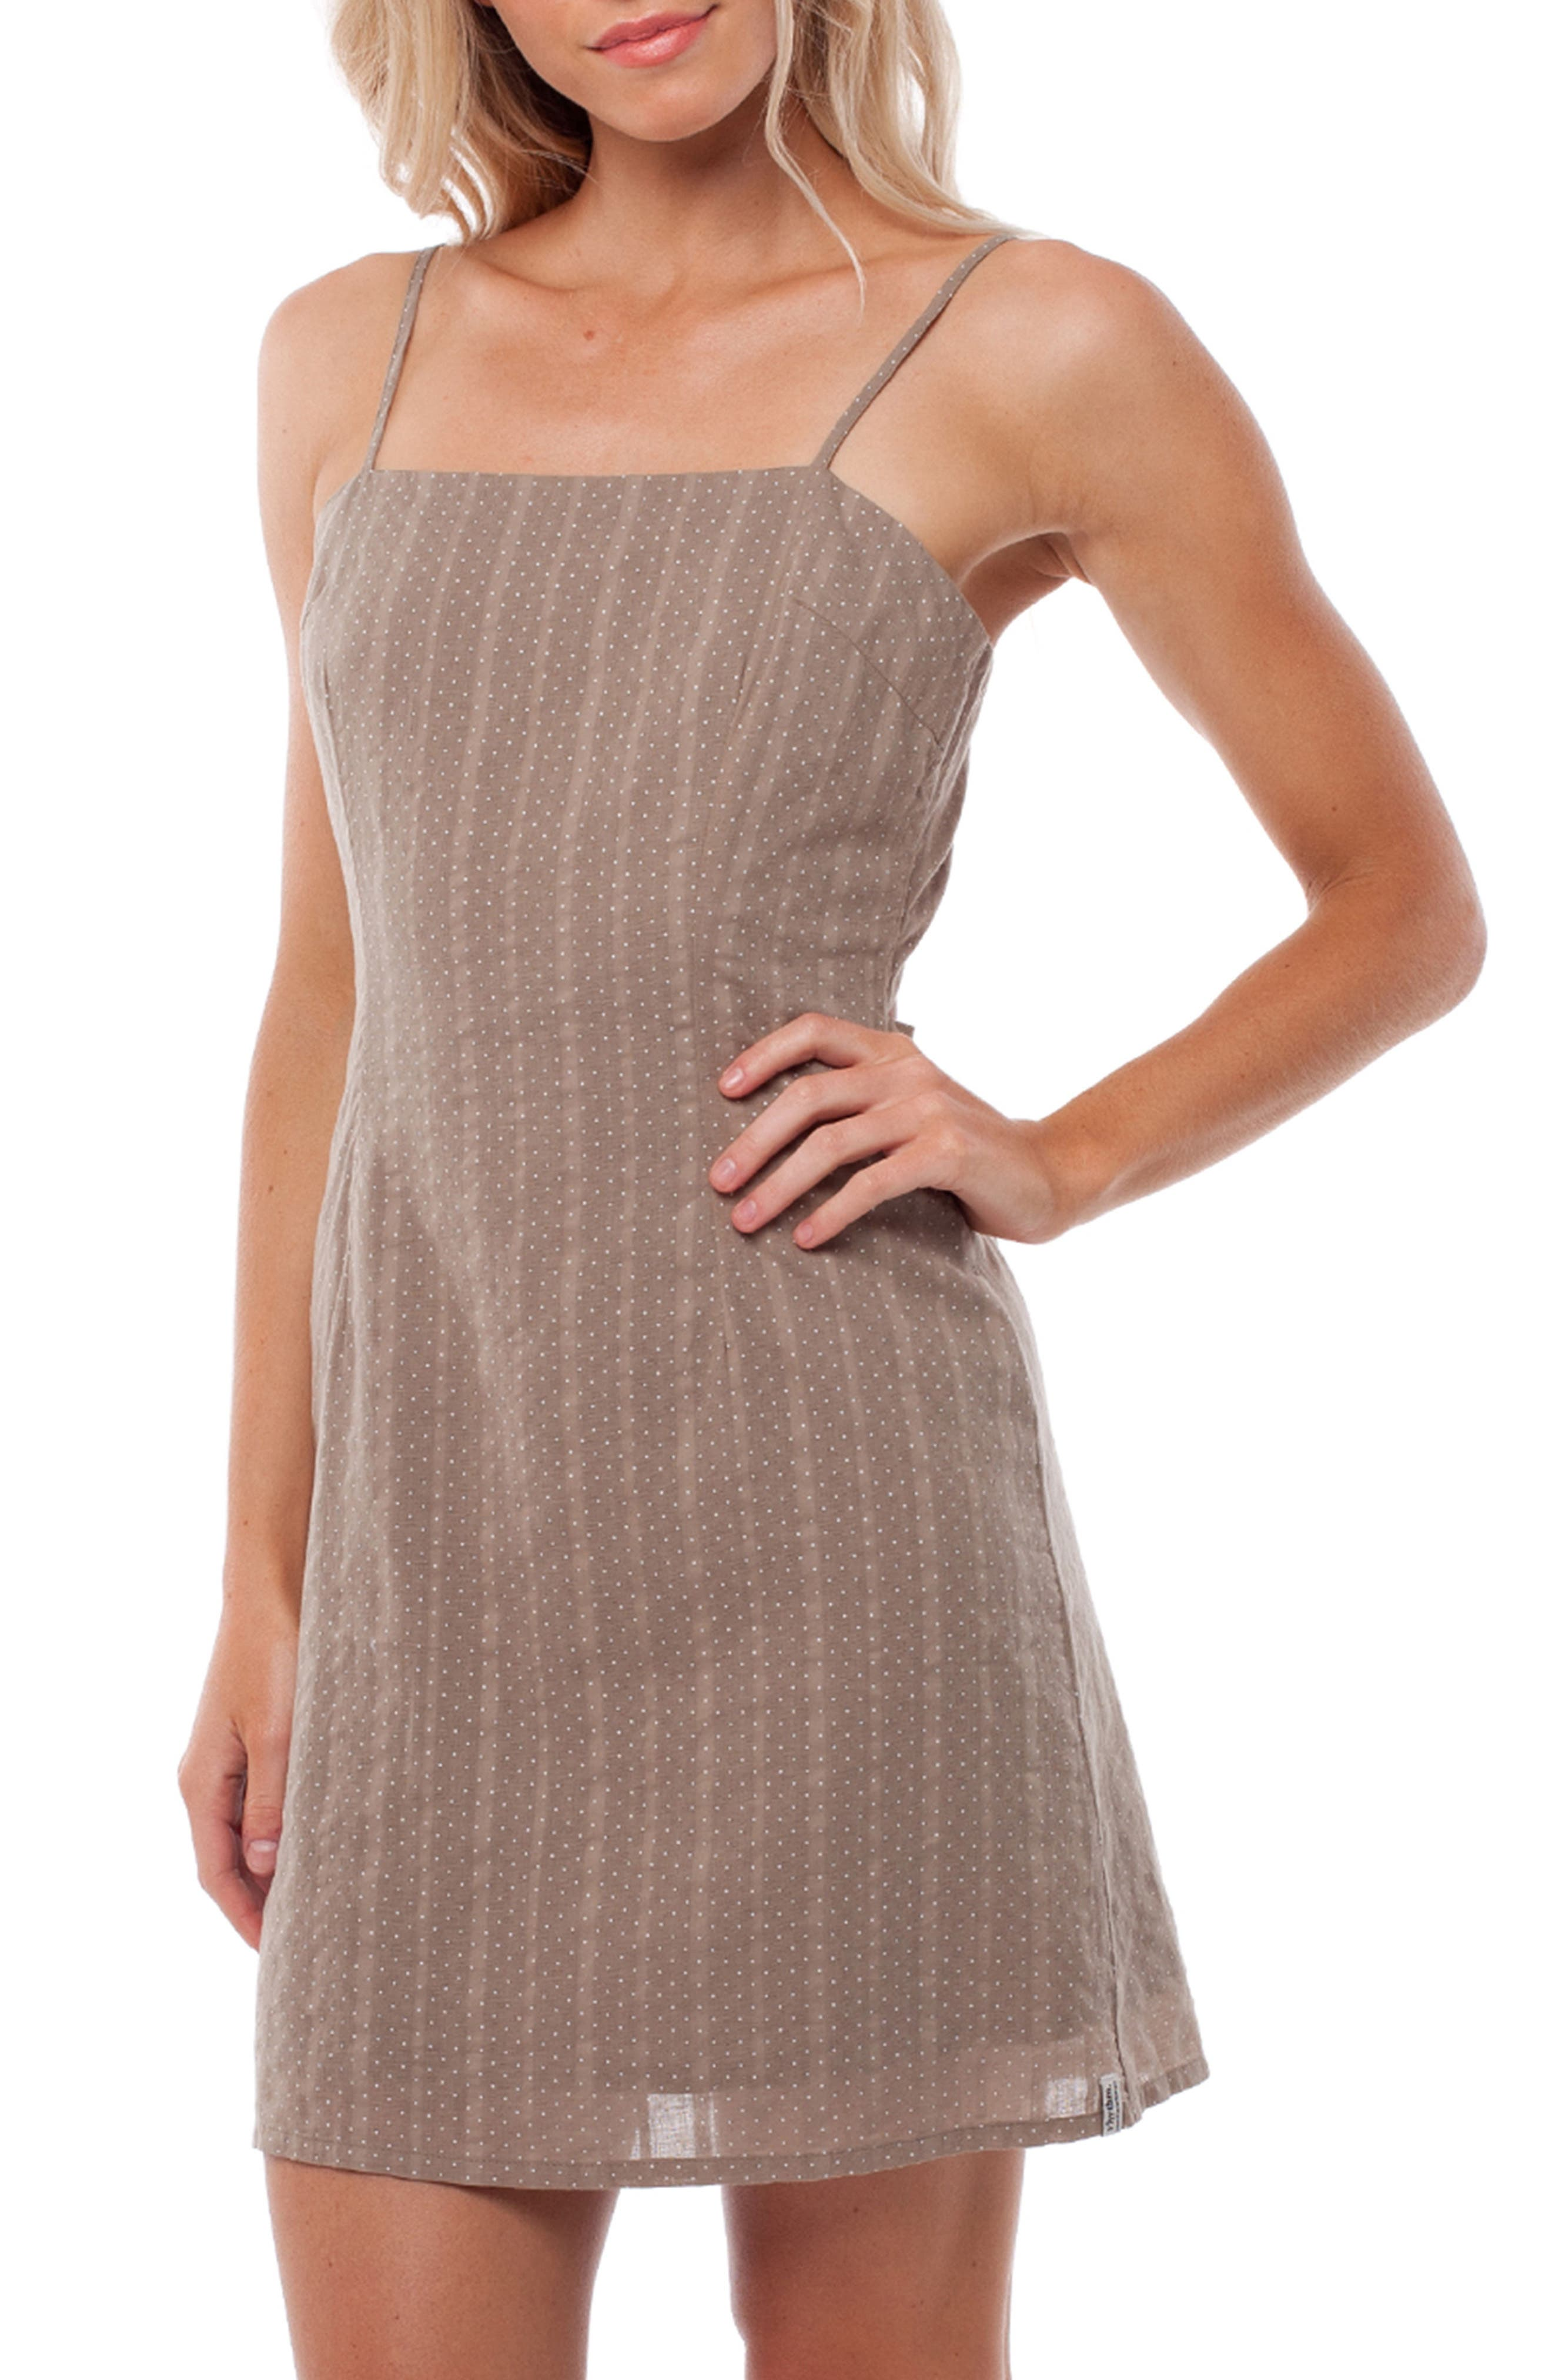 Messina Cover-Up Dress,                             Main thumbnail 1, color,                             Chai